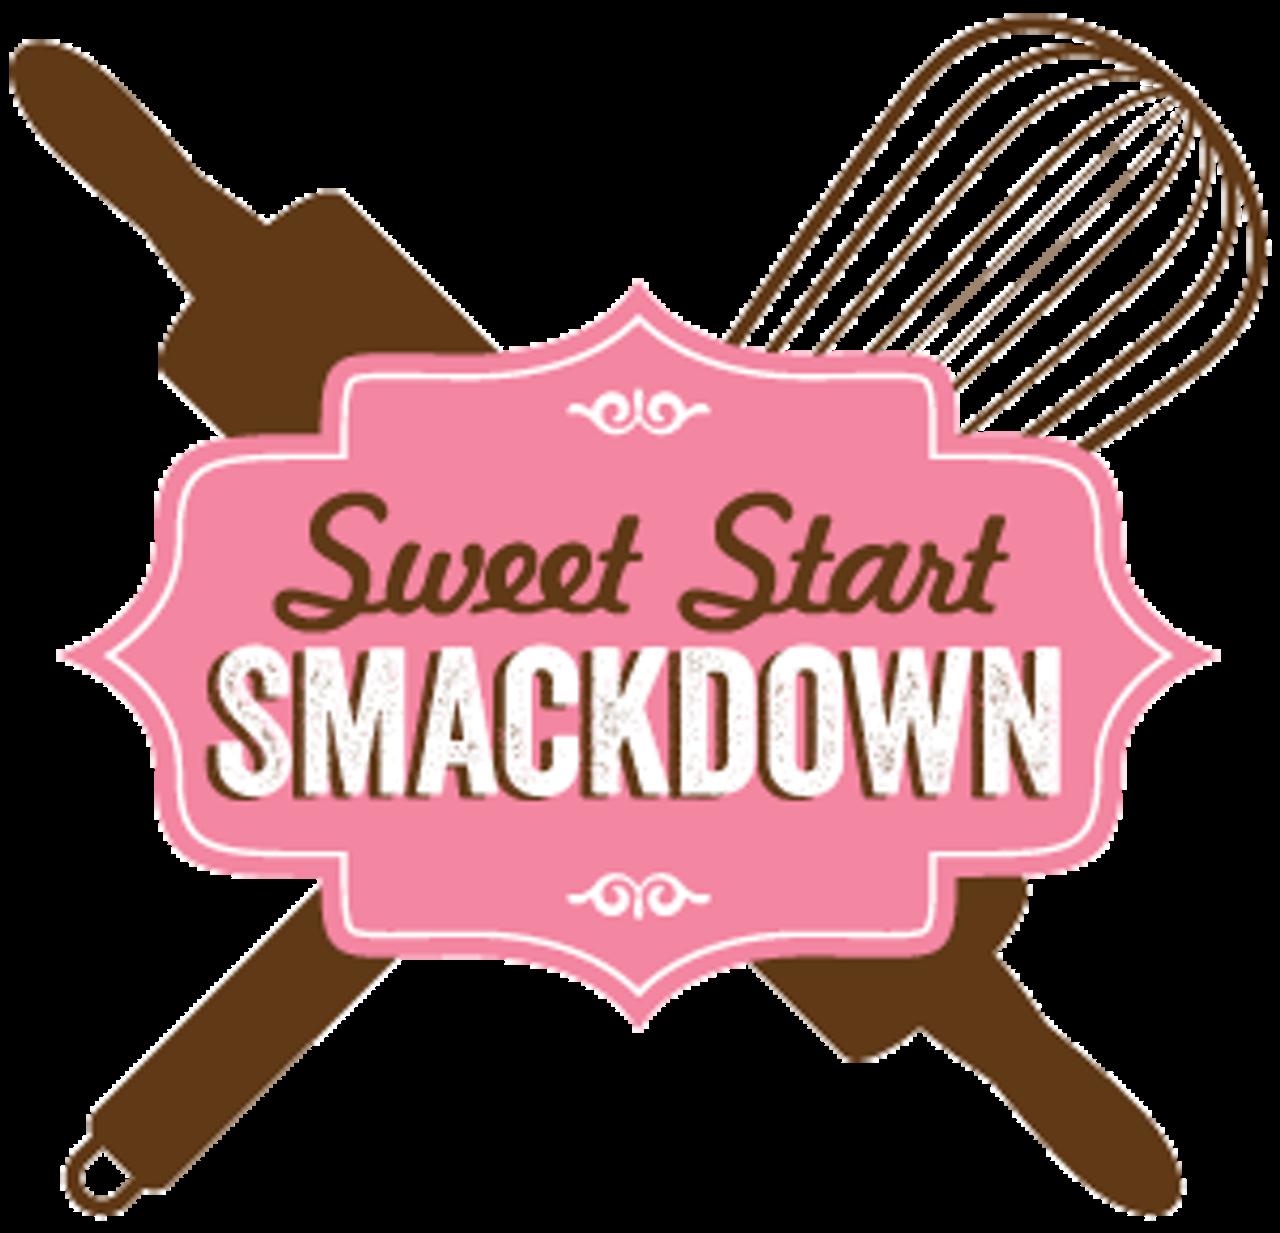 Clipart restaurant pastry chef. Sweet start smackdown vermont